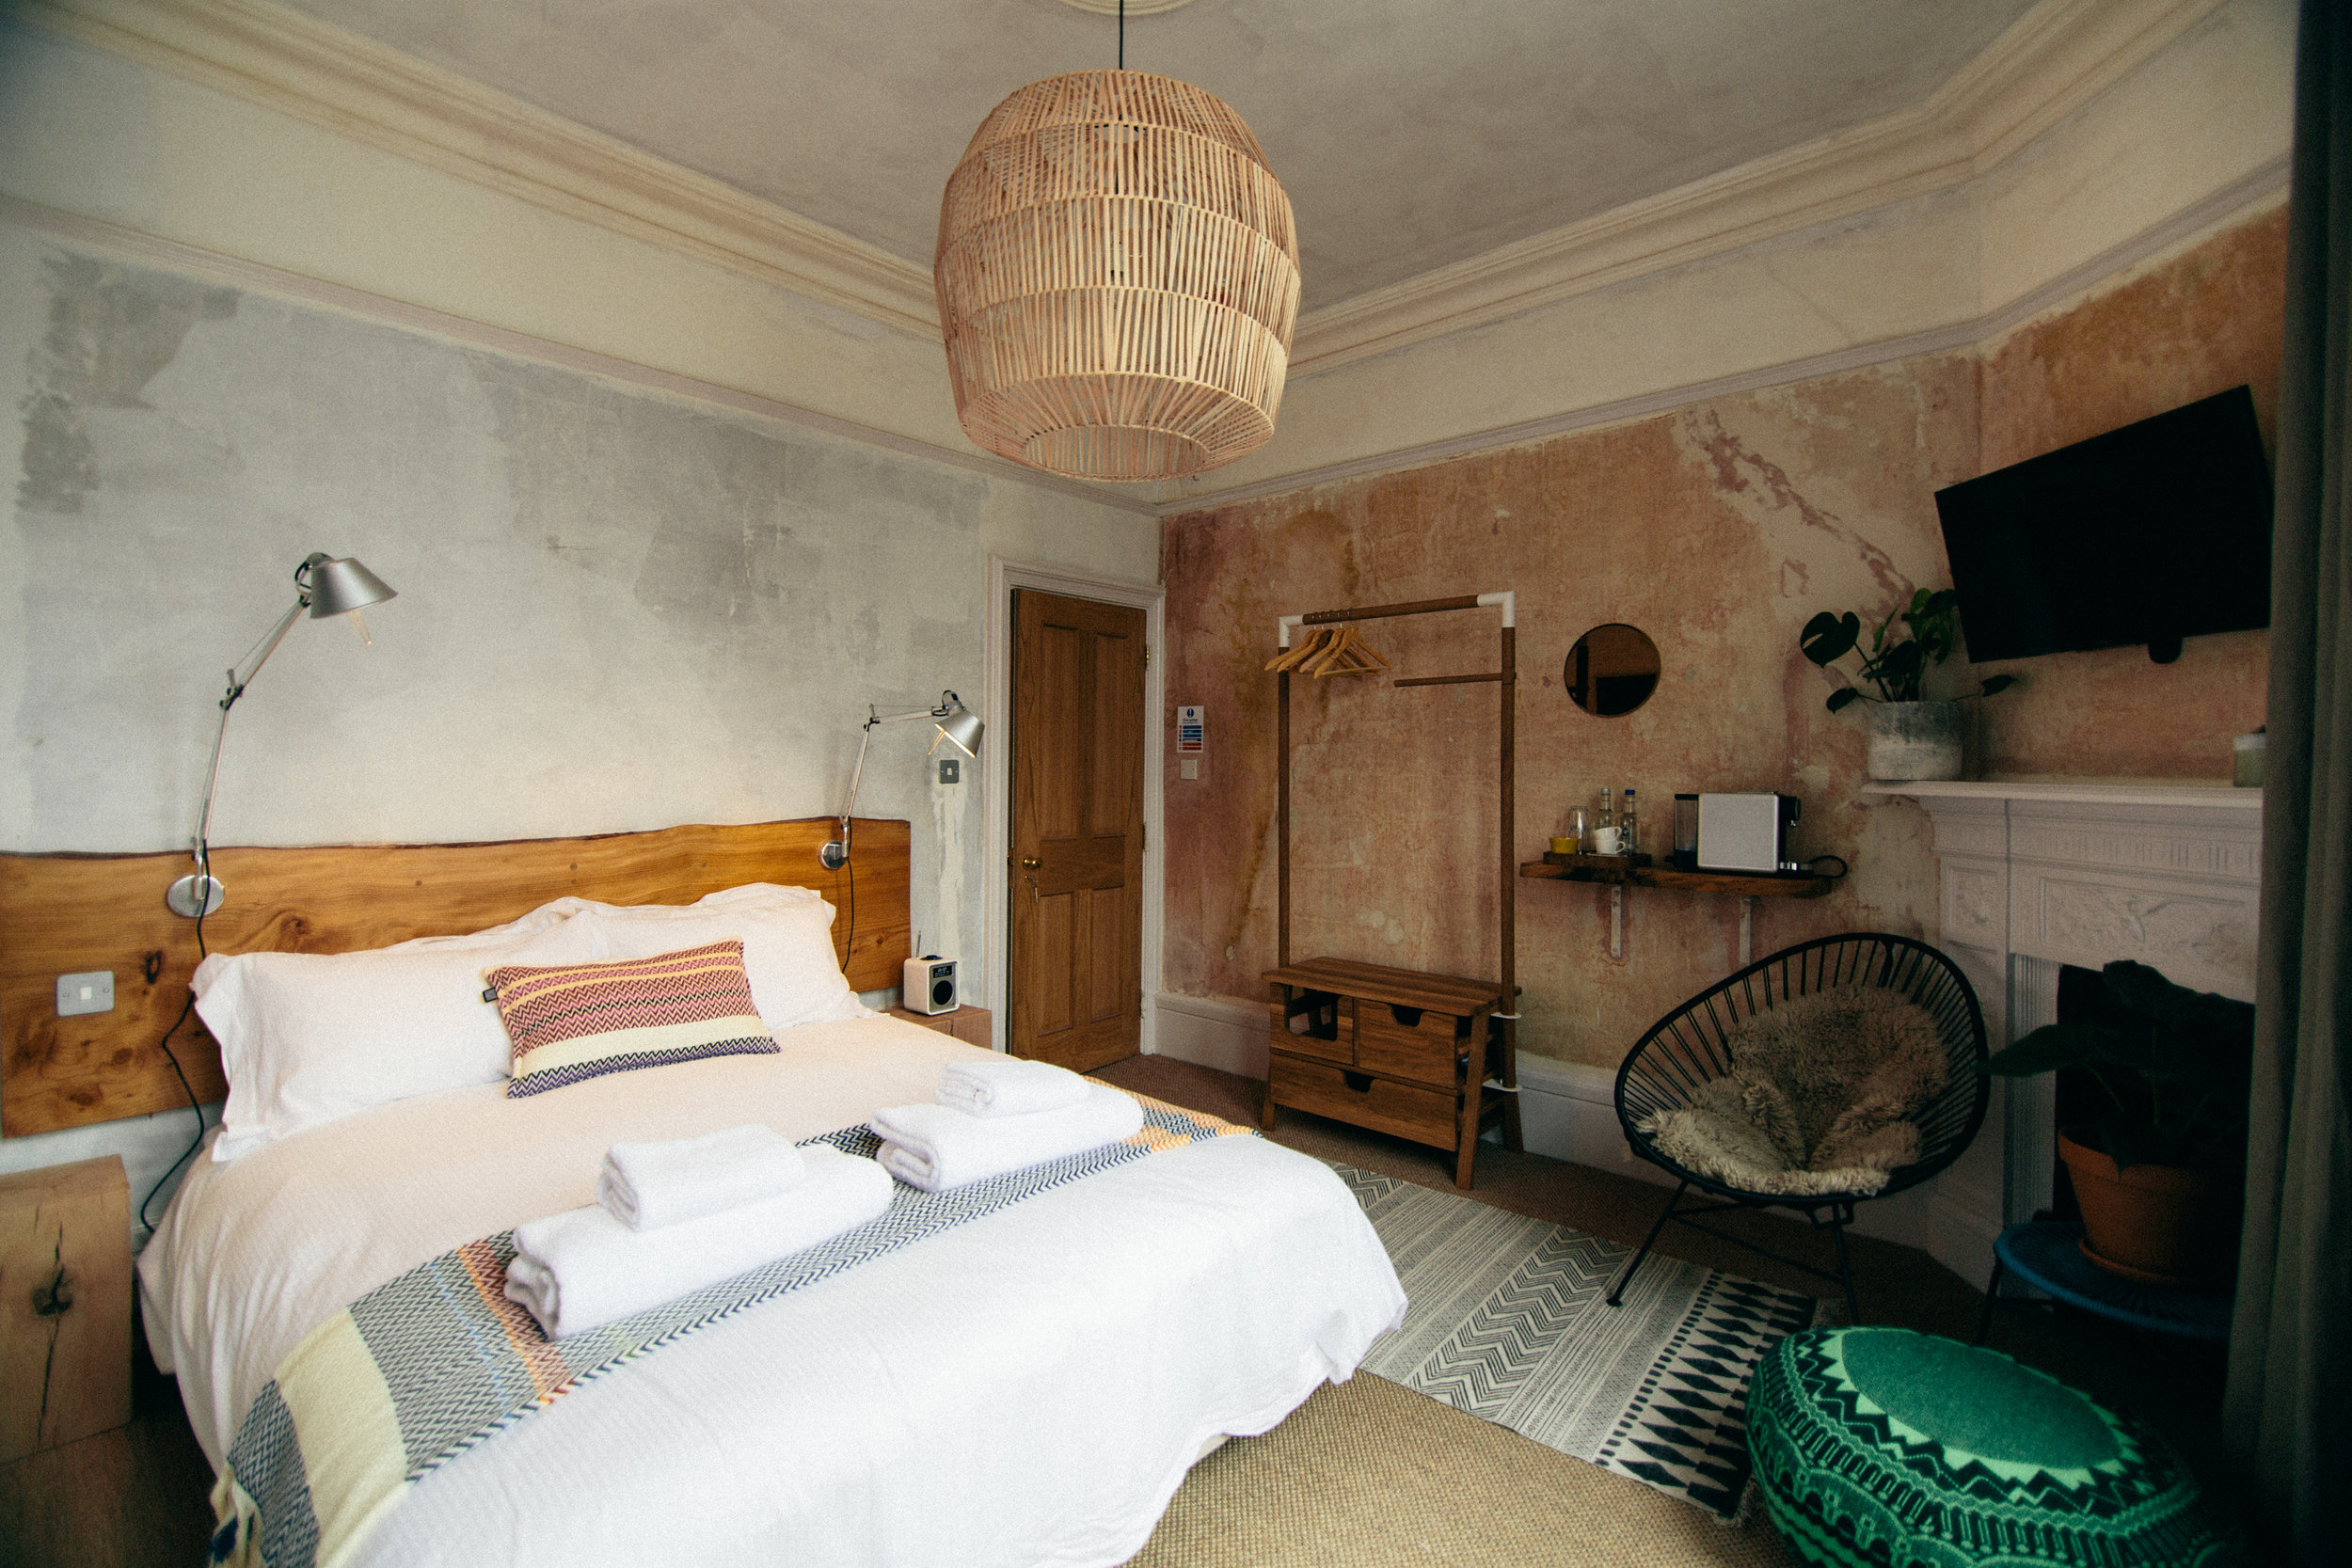 culpeper-london-room.jpg